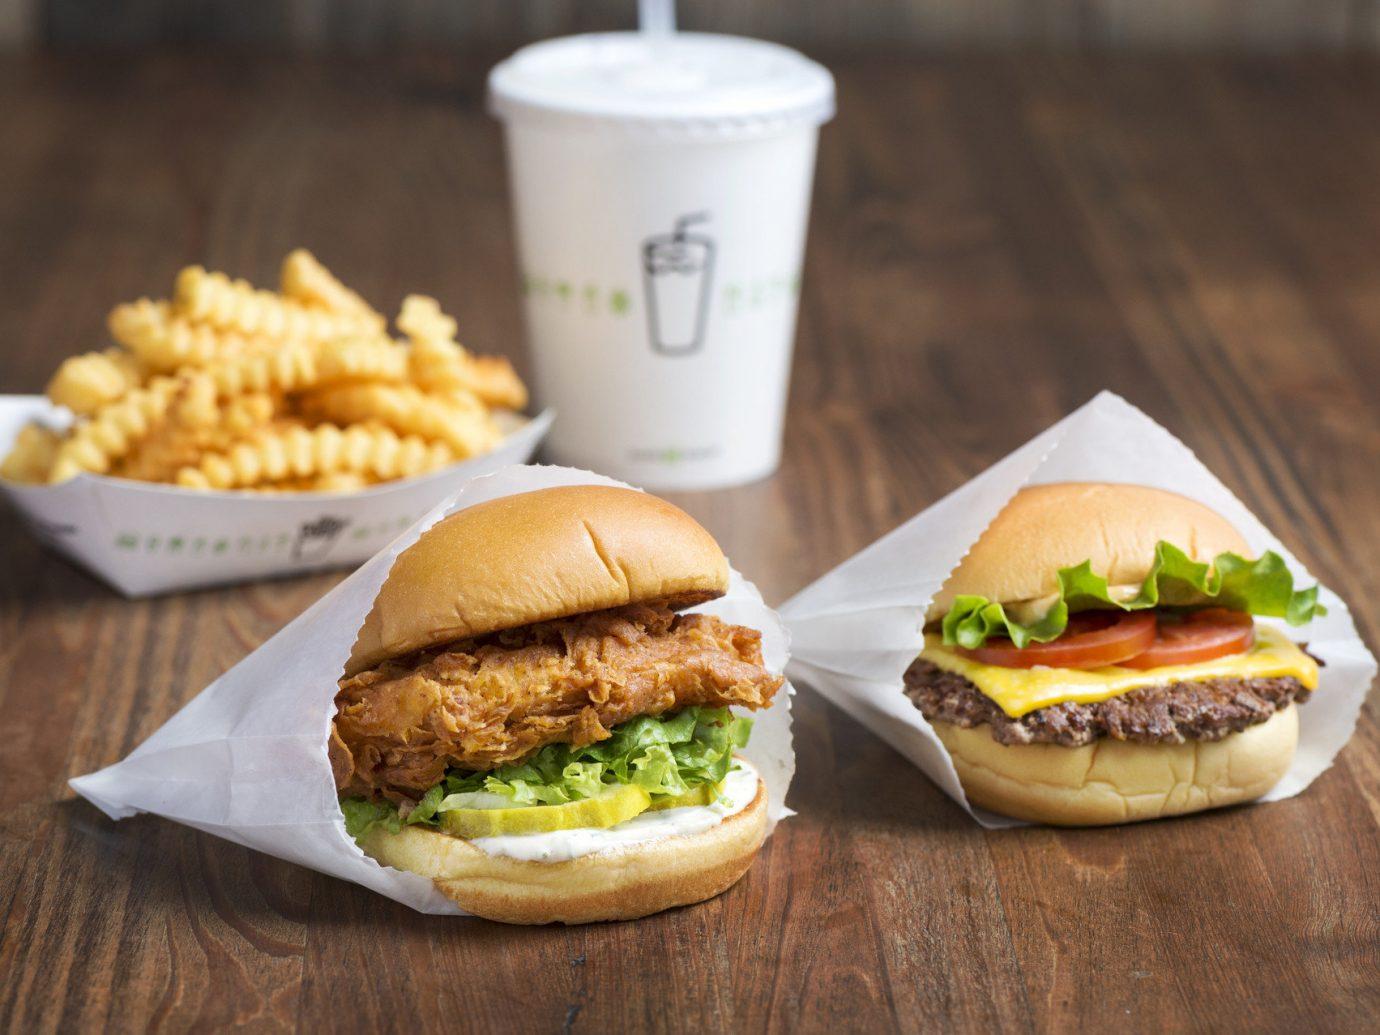 Food + Drink table food dish cup hamburger veggie burger meal slider fast food breakfast produce sandwich wooden snack food cuisine vegetable meat cheeseburger